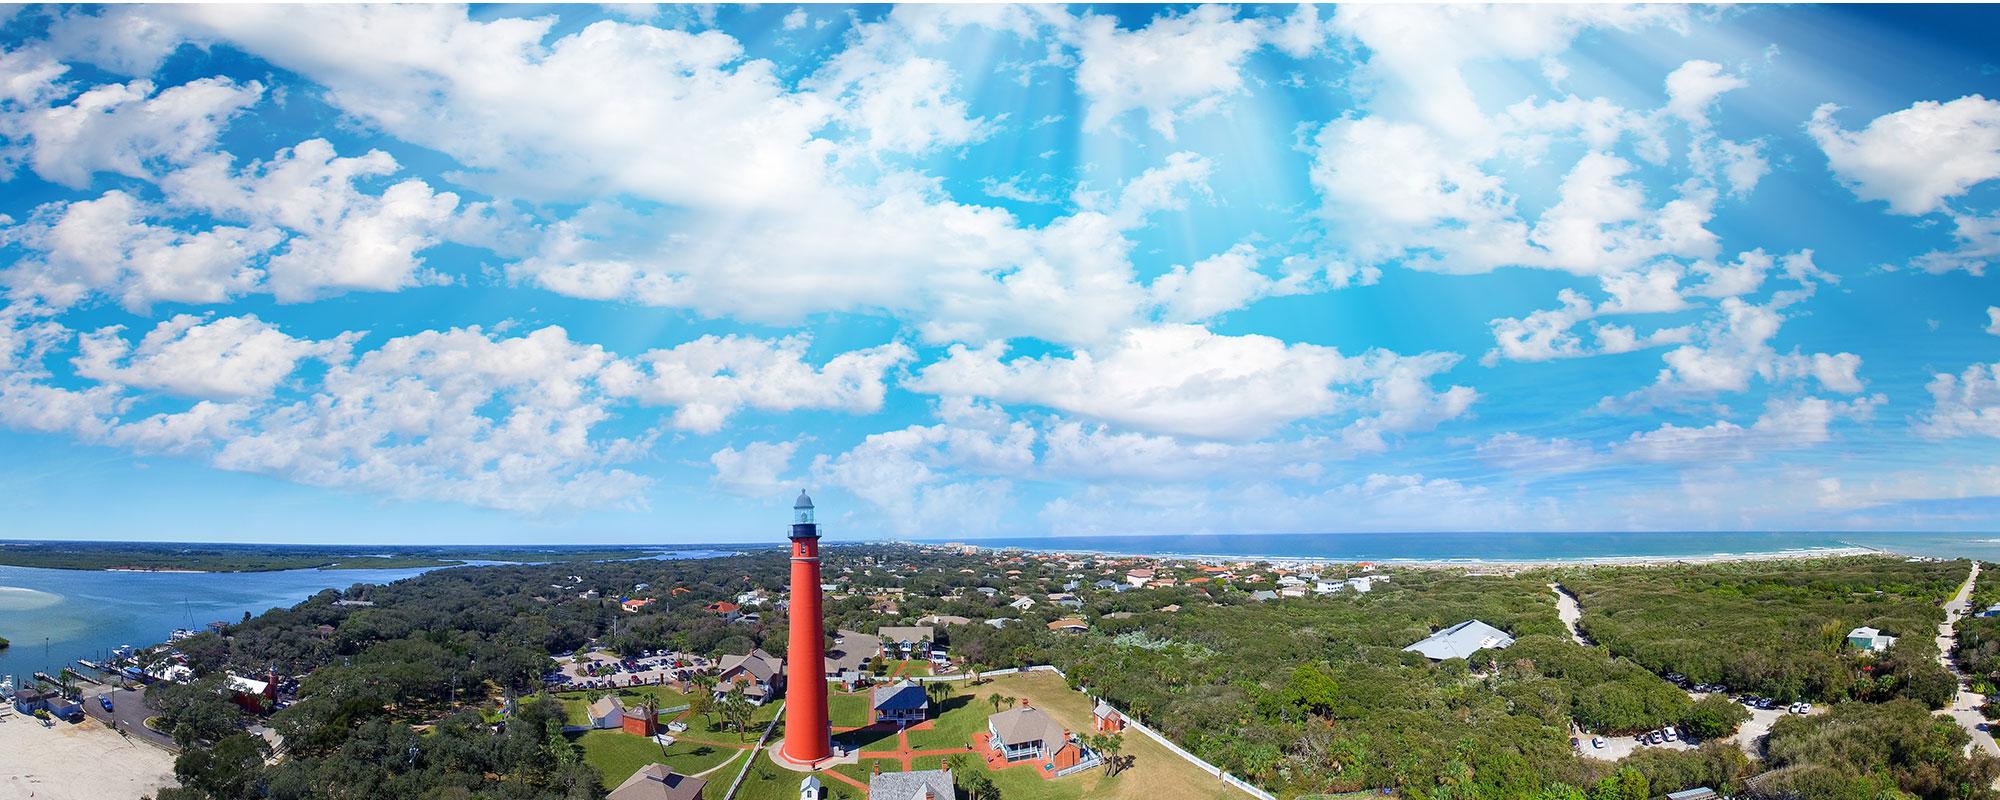 Daytona Beach 1044343378.jpg